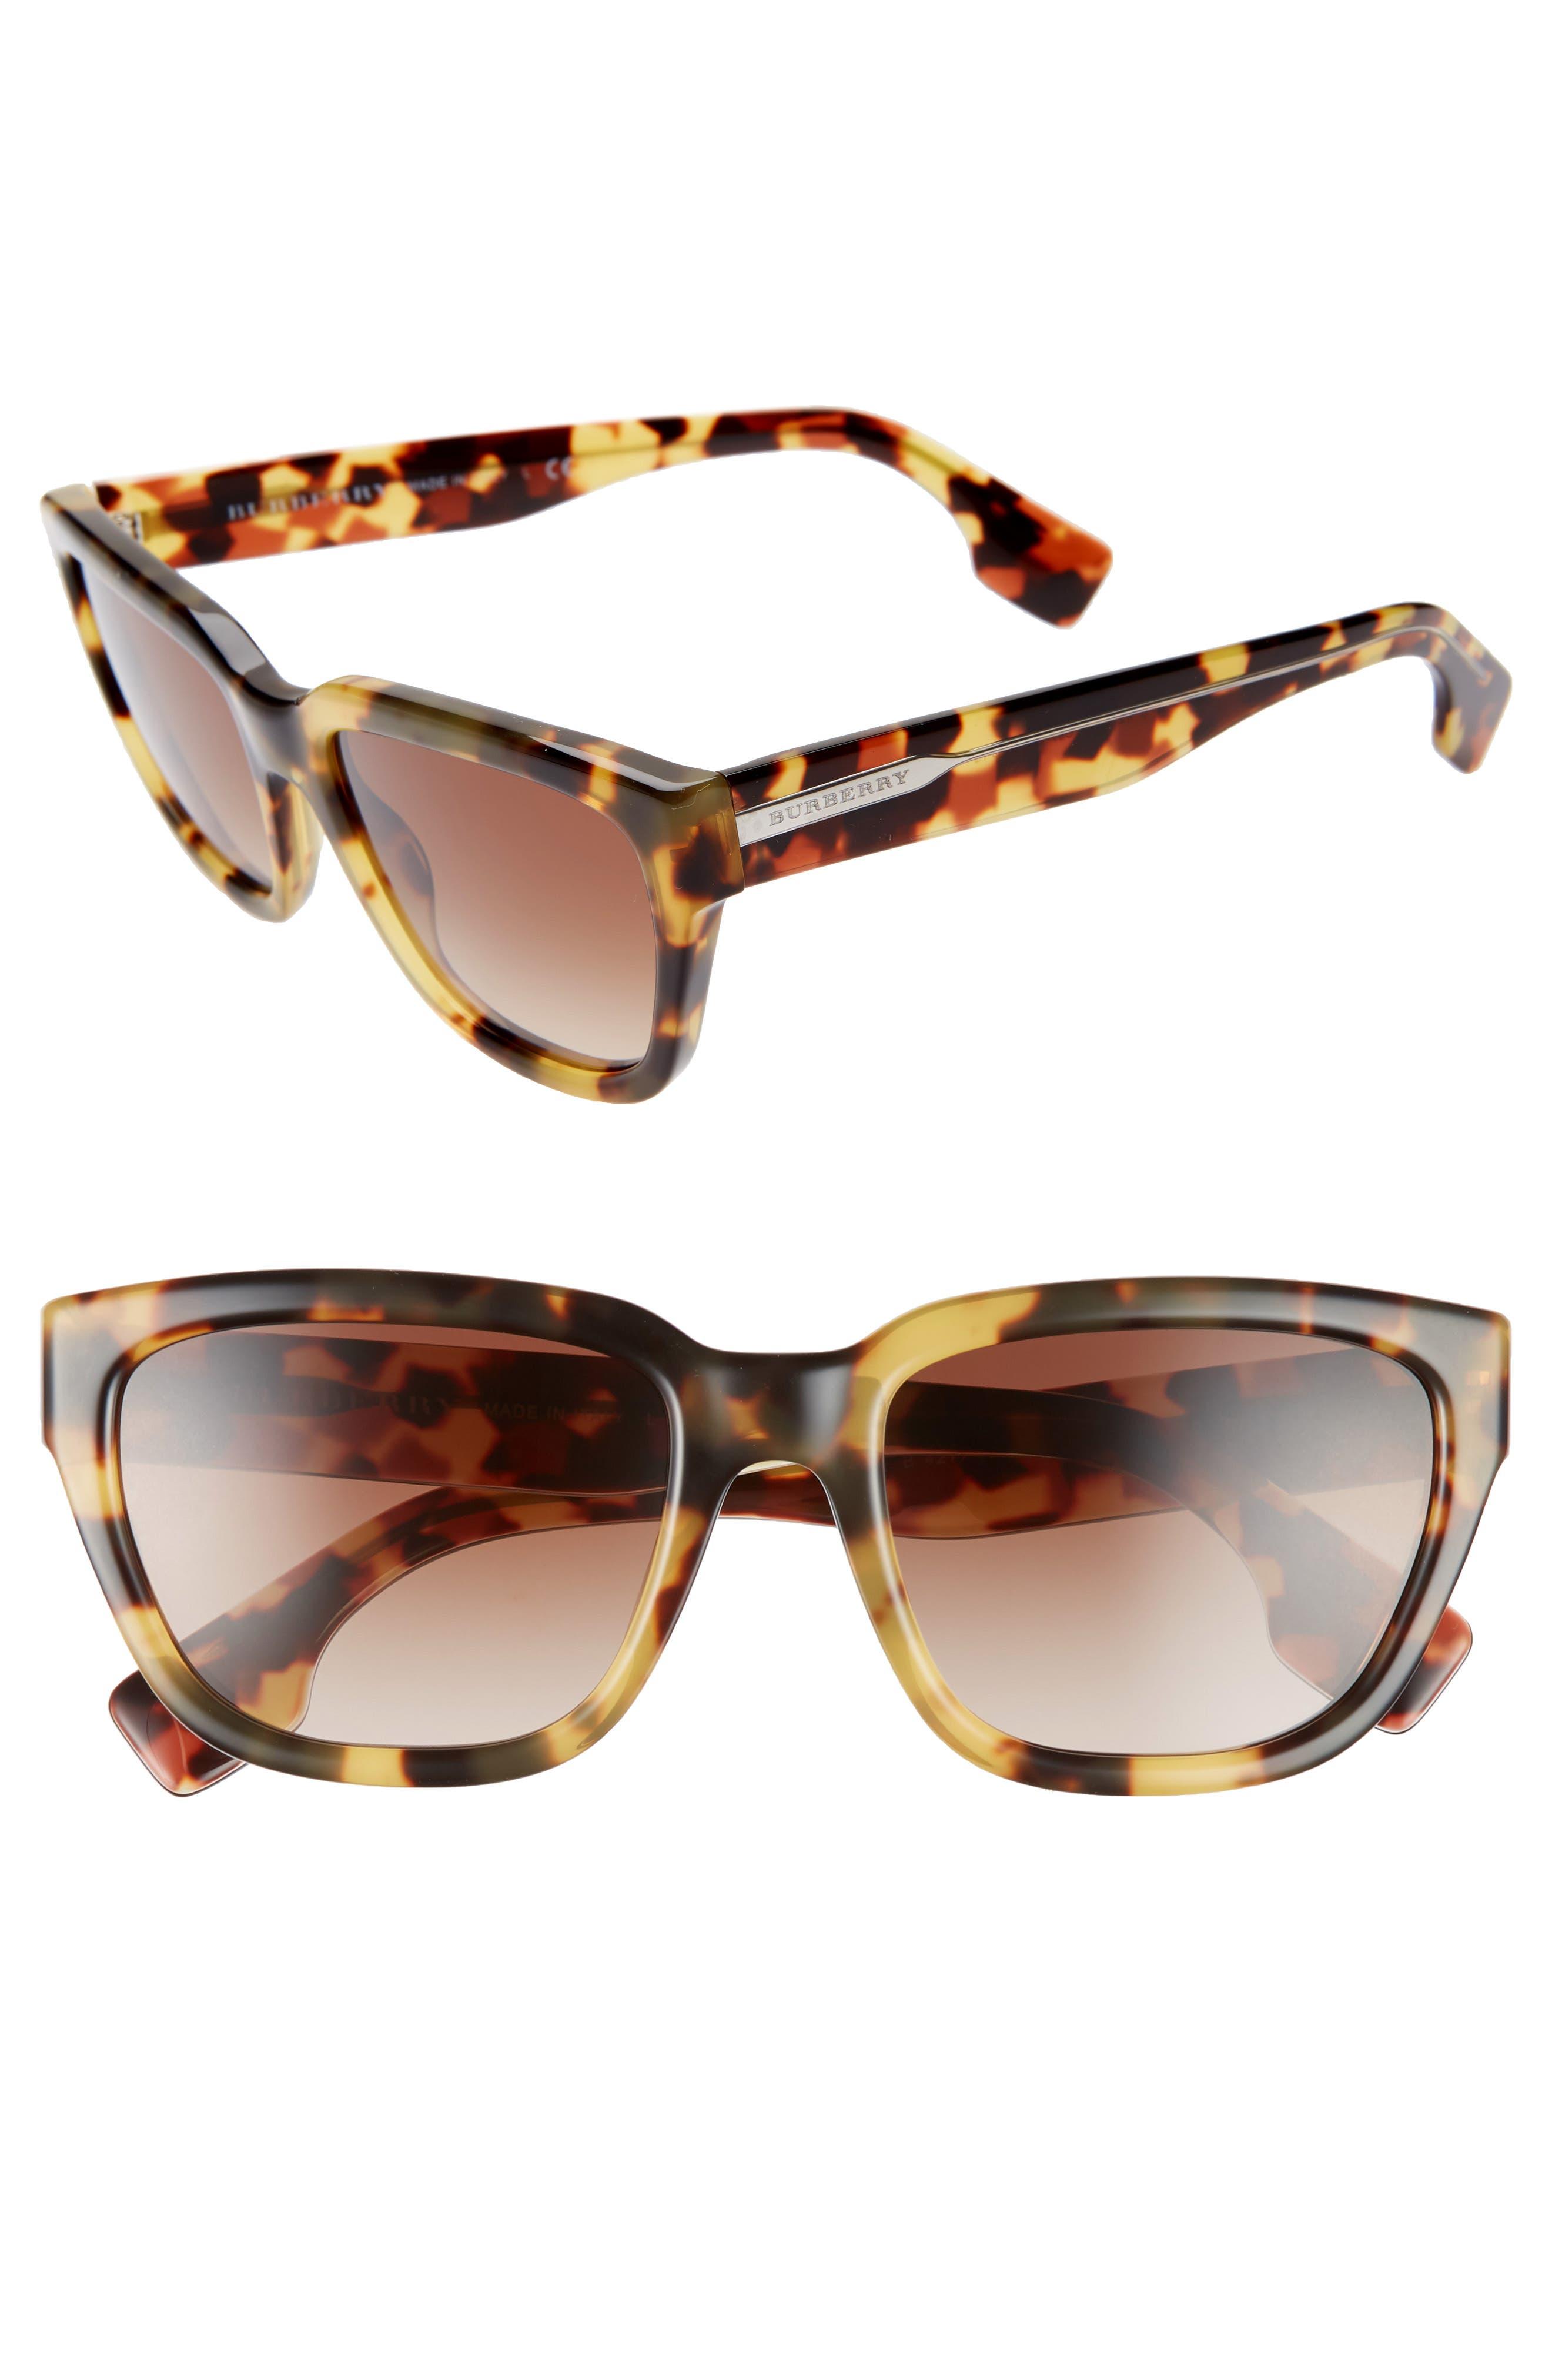 54mm Square Sunglasses,                         Main,                         color, LITE HAVANA/ BROWN GRADIENT